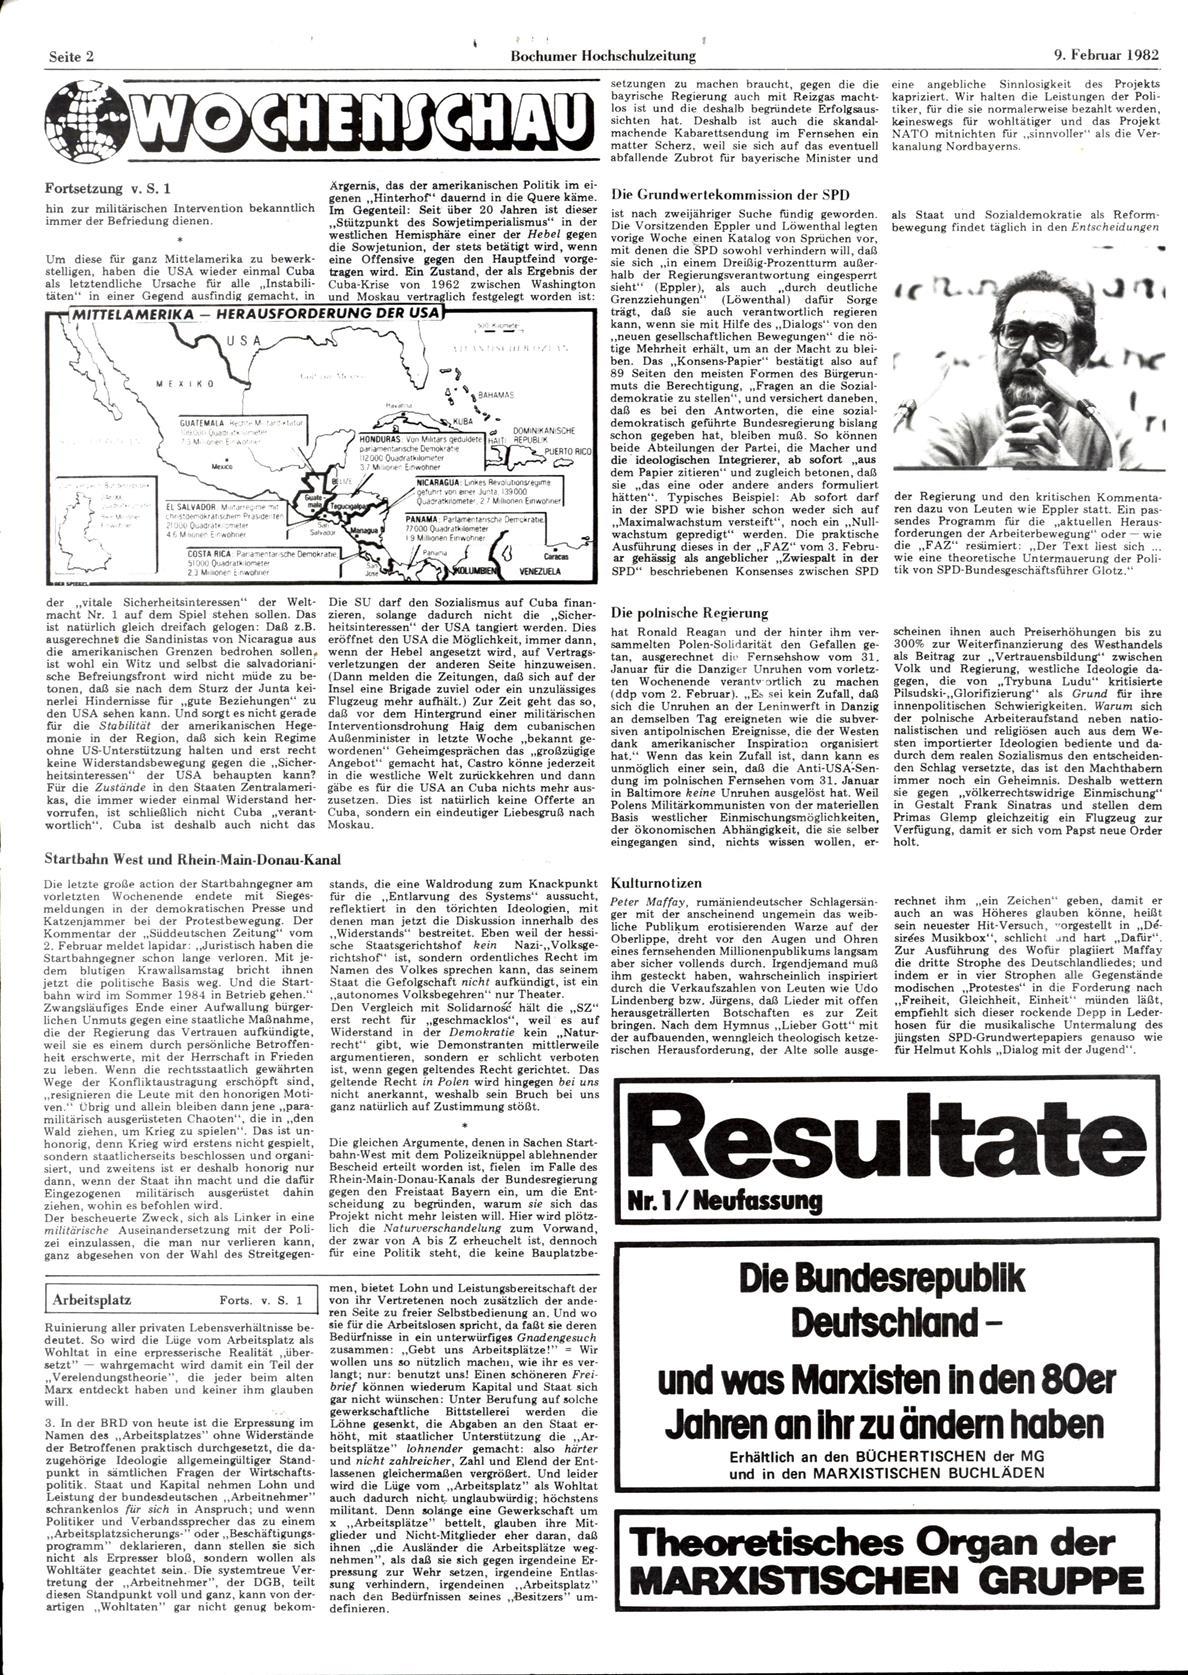 Bochum_BHZ_19820209_047_002